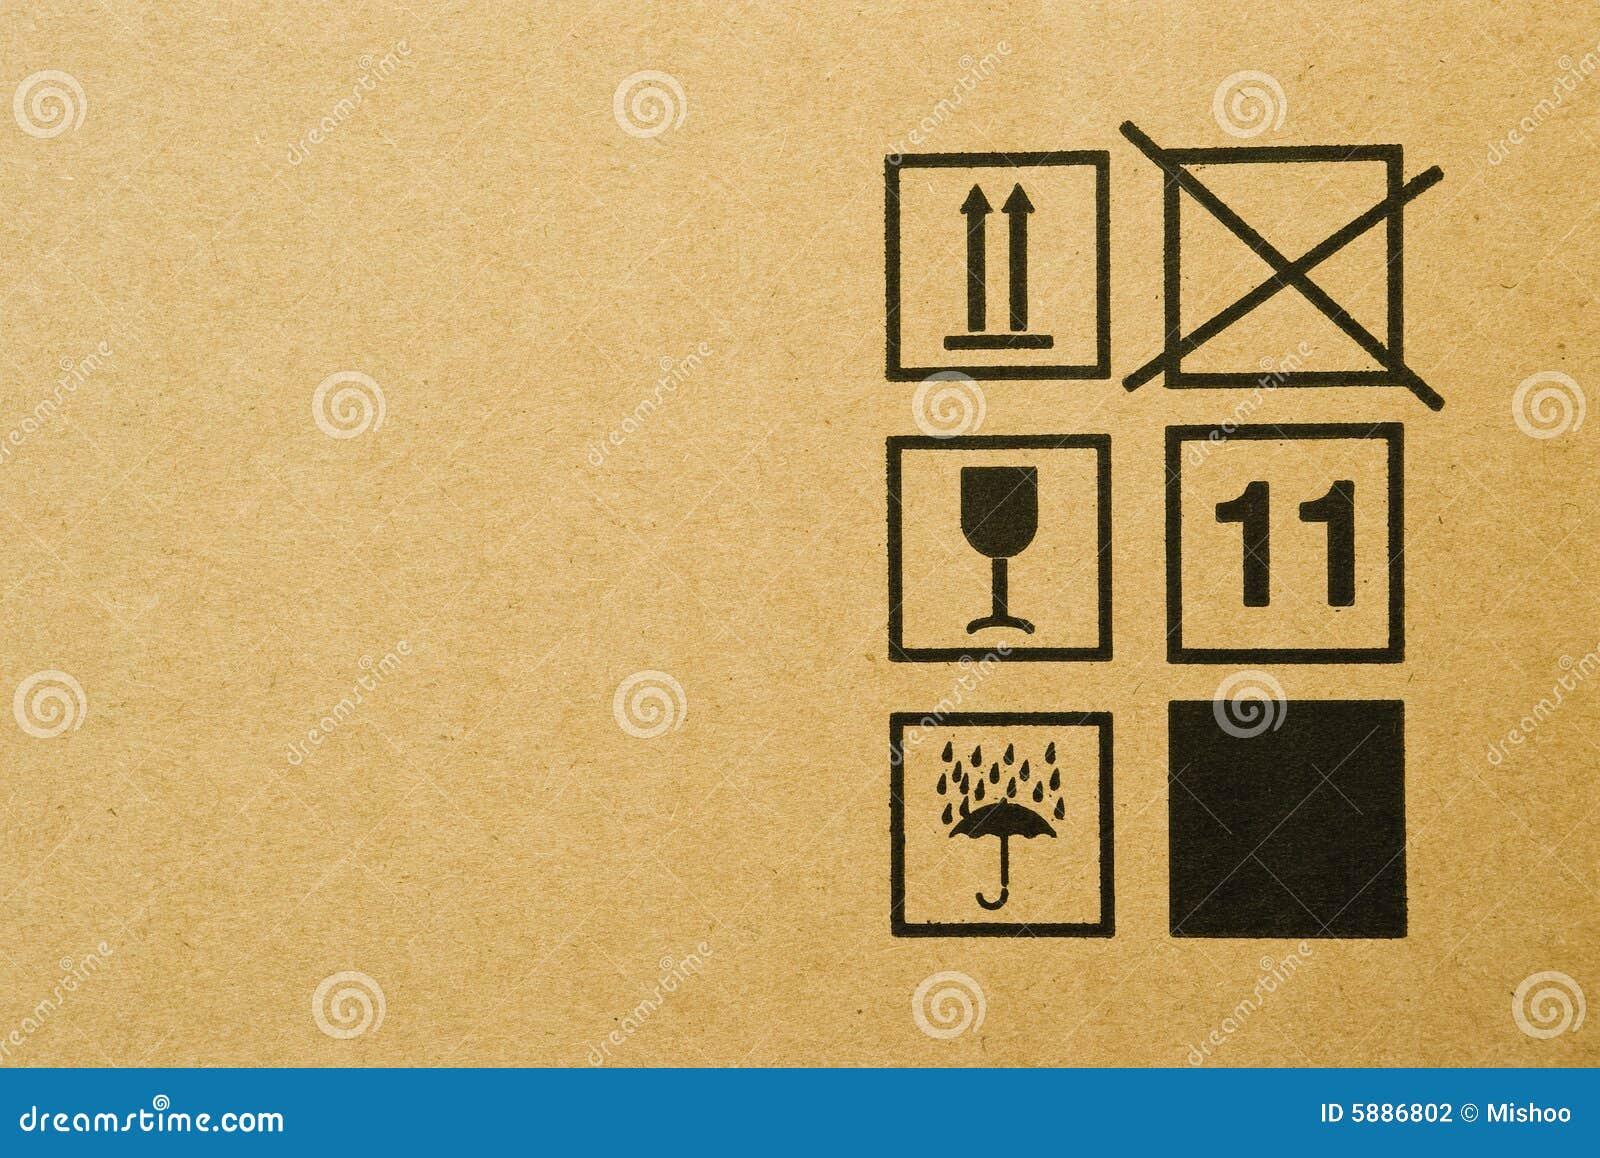 Cardboard box symbols stock photos 193 images cardboard box texture cardboard box background with mail symbols stock photography biocorpaavc Choice Image